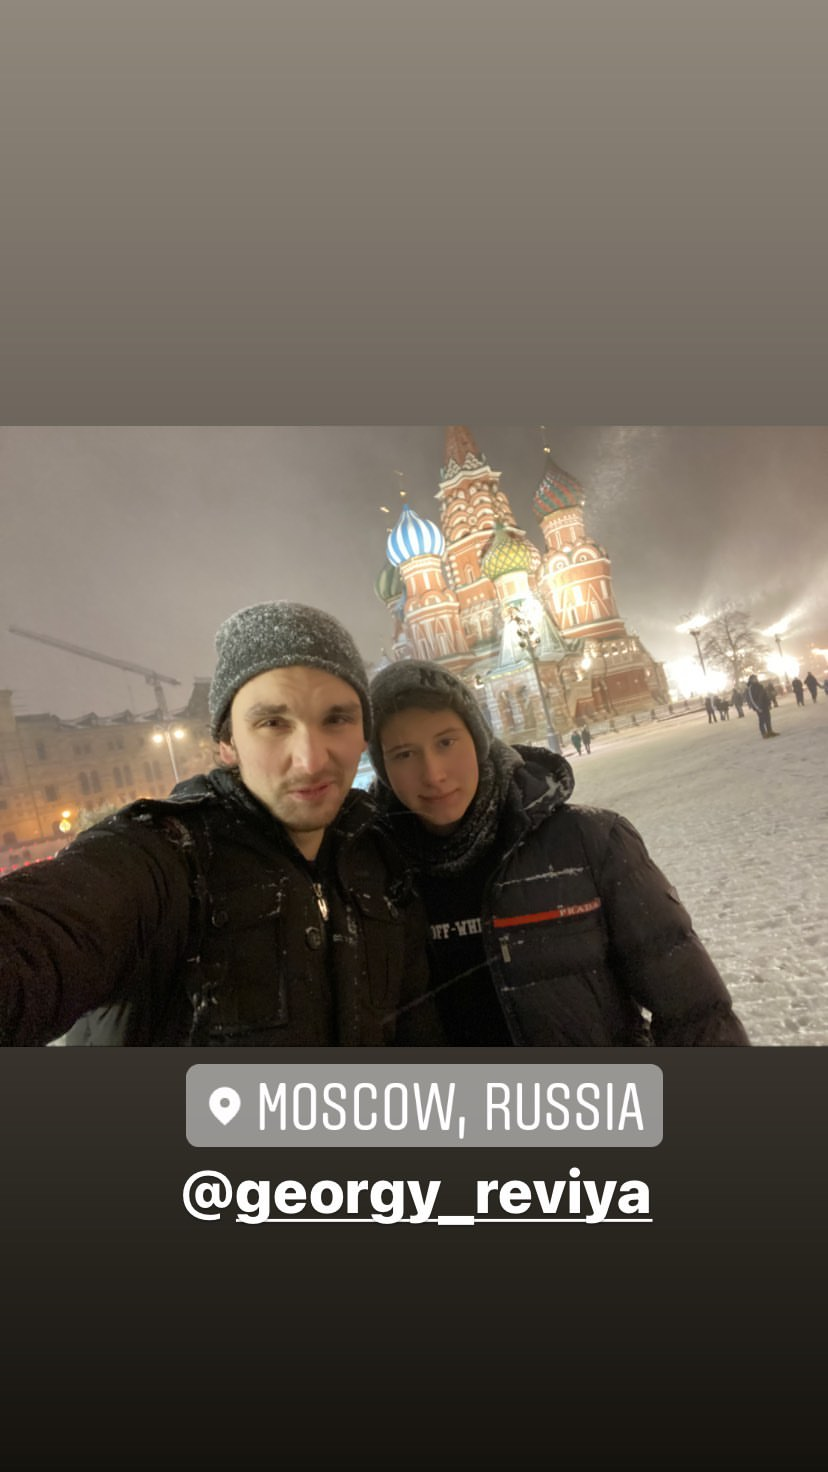 https://i3.imageban.ru/out/2021/03/08/08fc0f486a0e8f3c7082b070e4eee11b.jpg